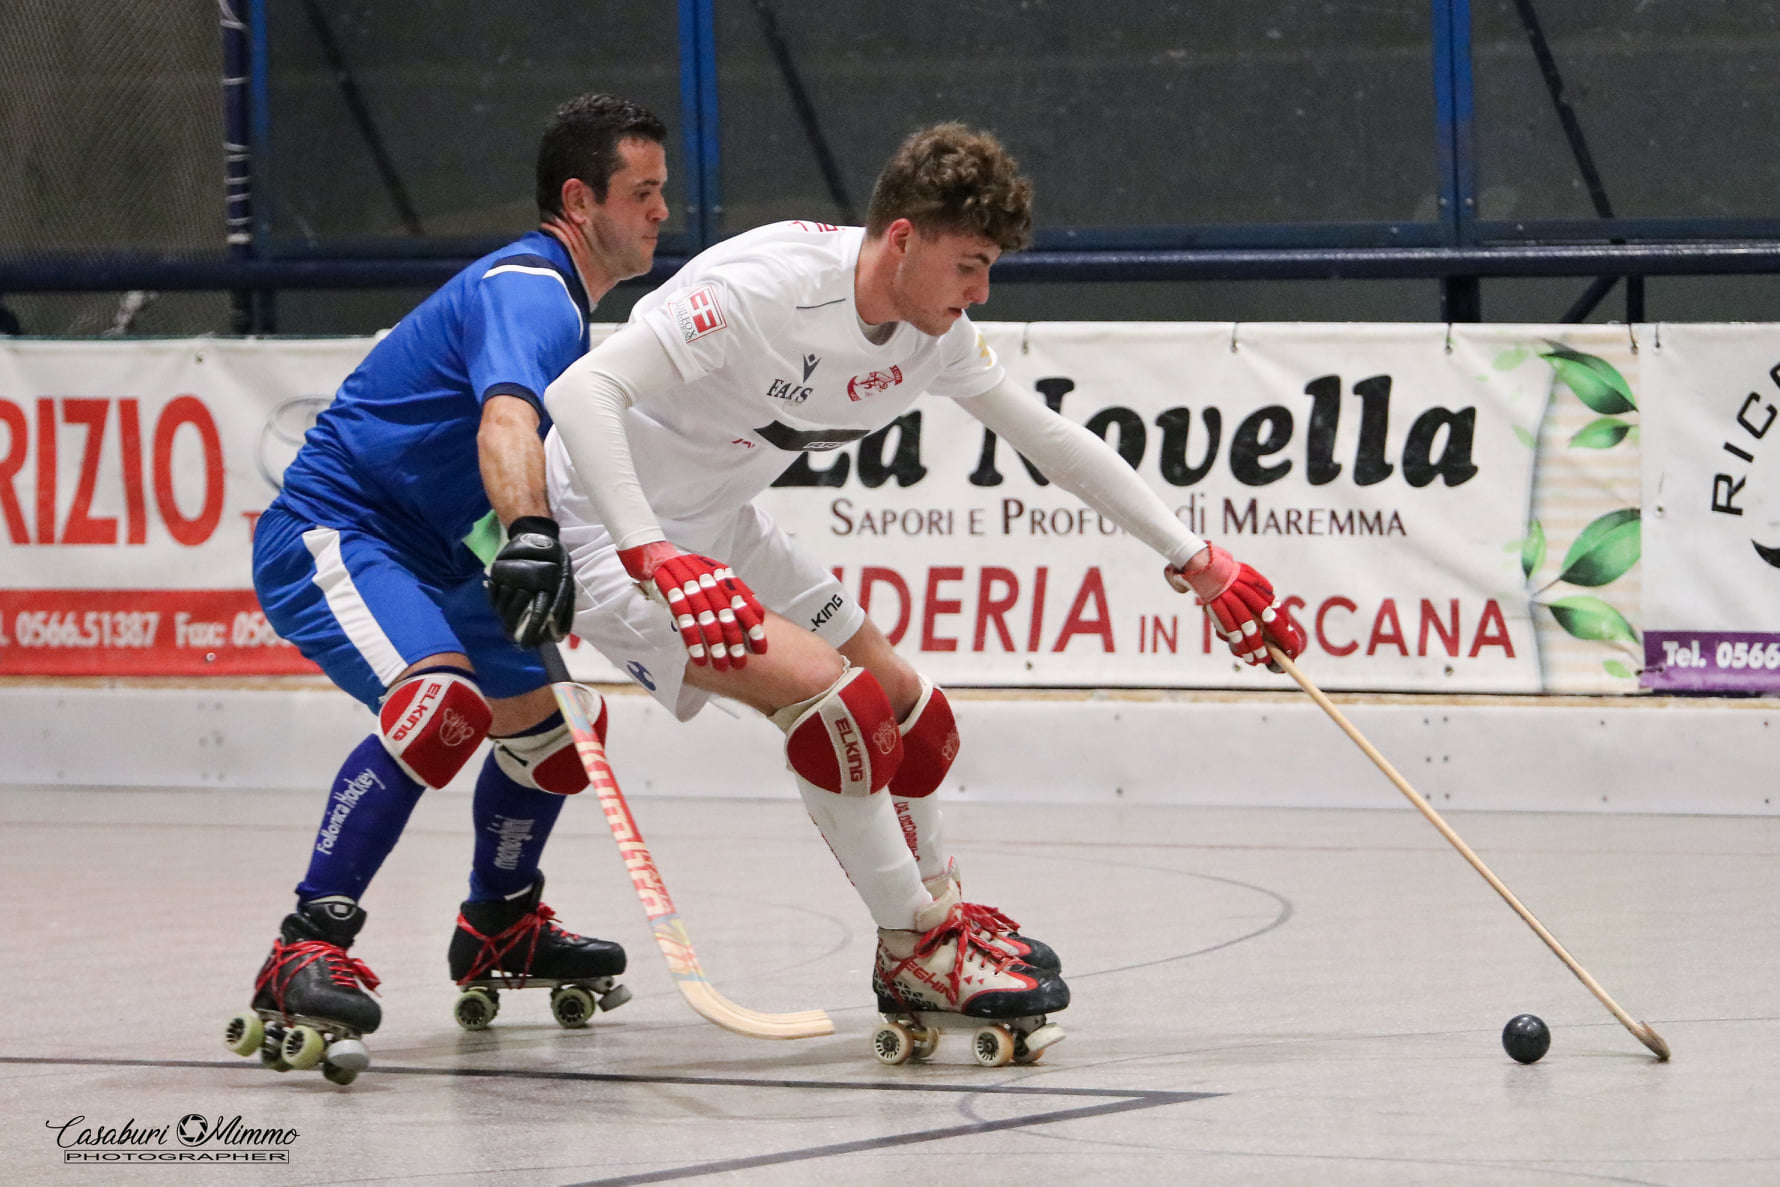 hockey-pista-circolo-pattinatori-grosseto-RRD_Leonardo-Ciupi-serie-A1